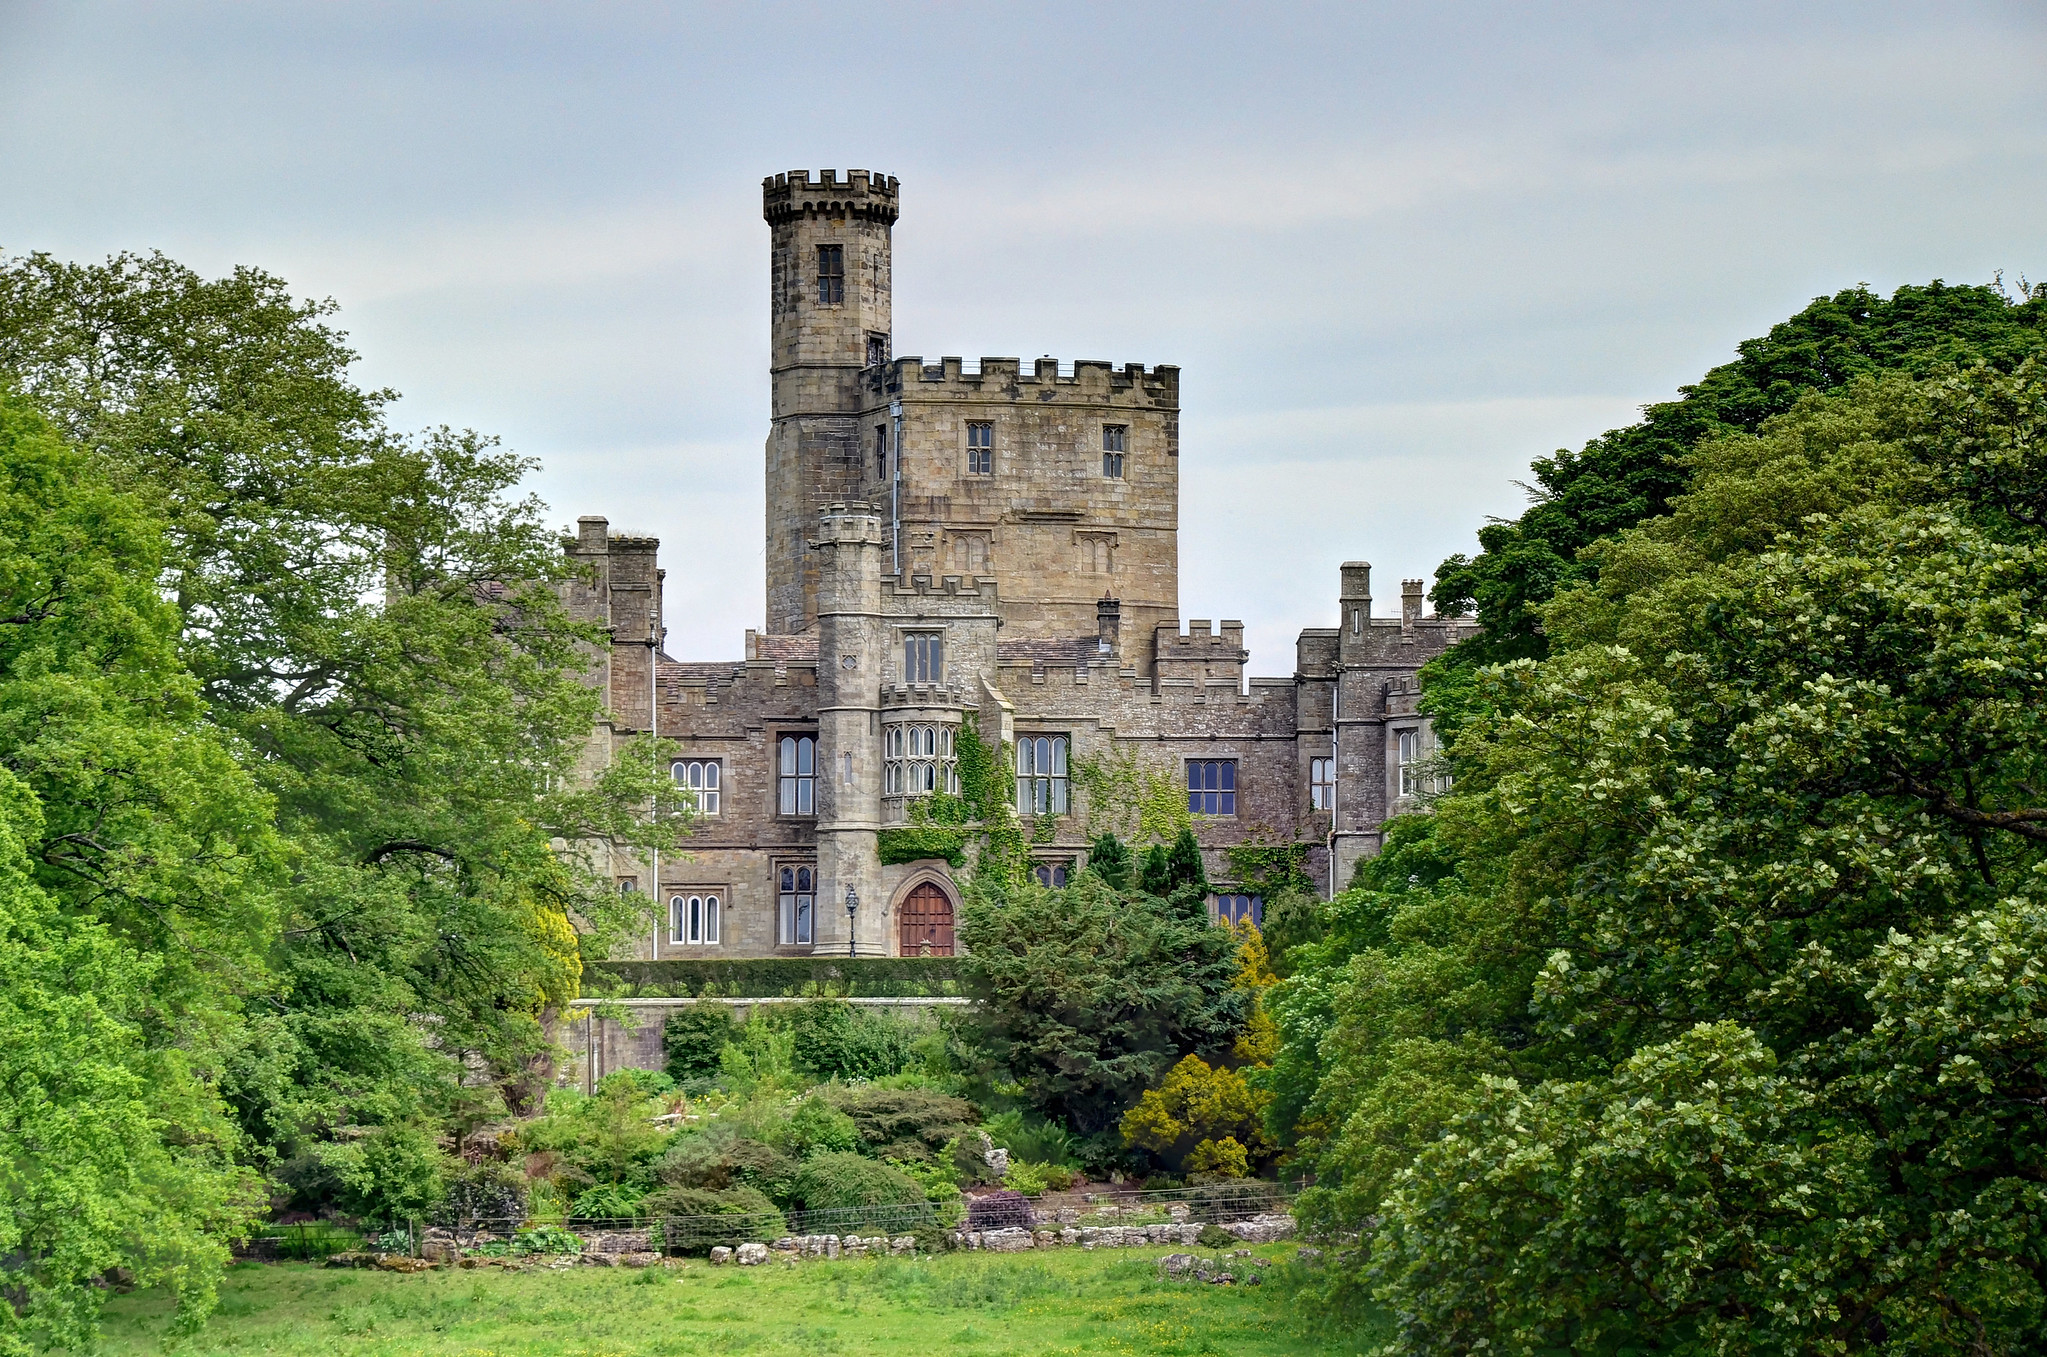 Hornby Castle, Hornby, Lancashire